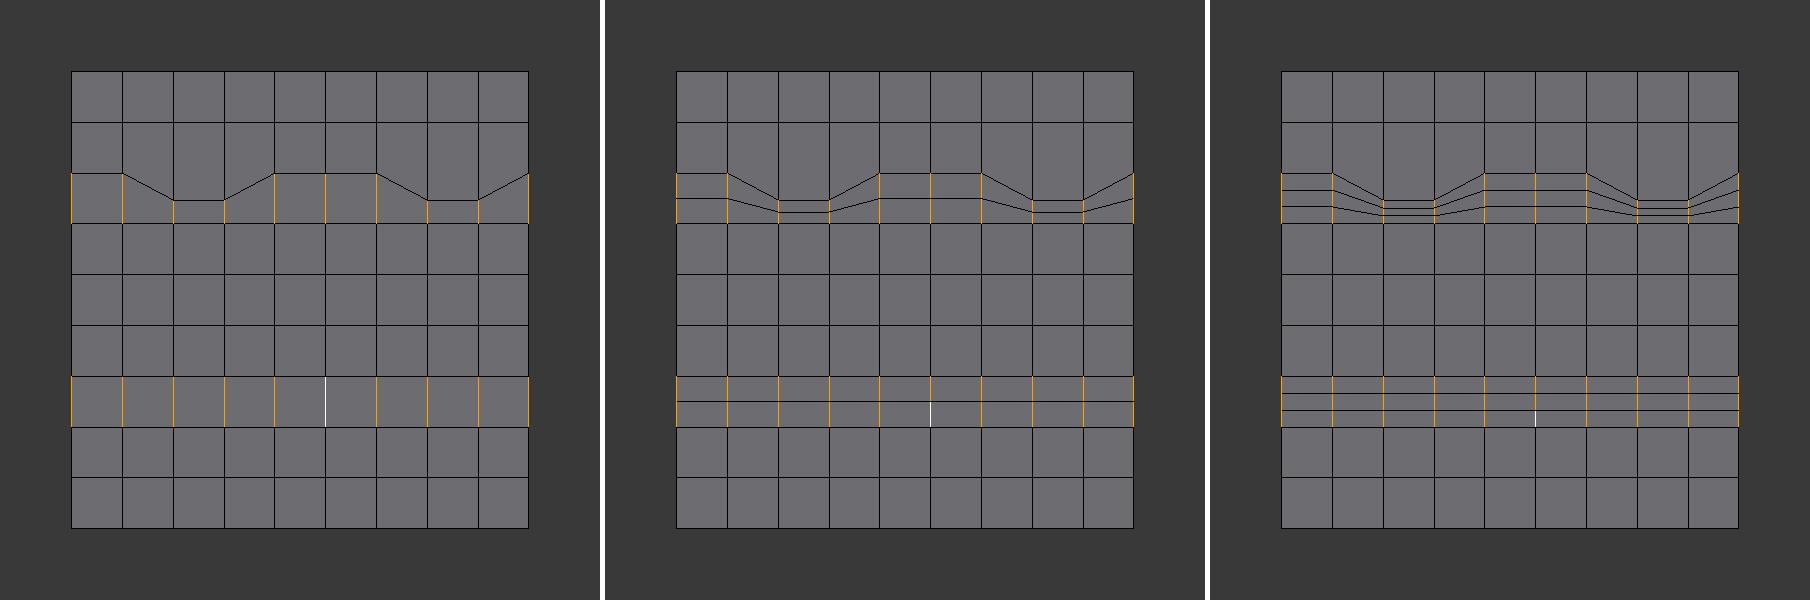 subdivide-edge-ring-cuts